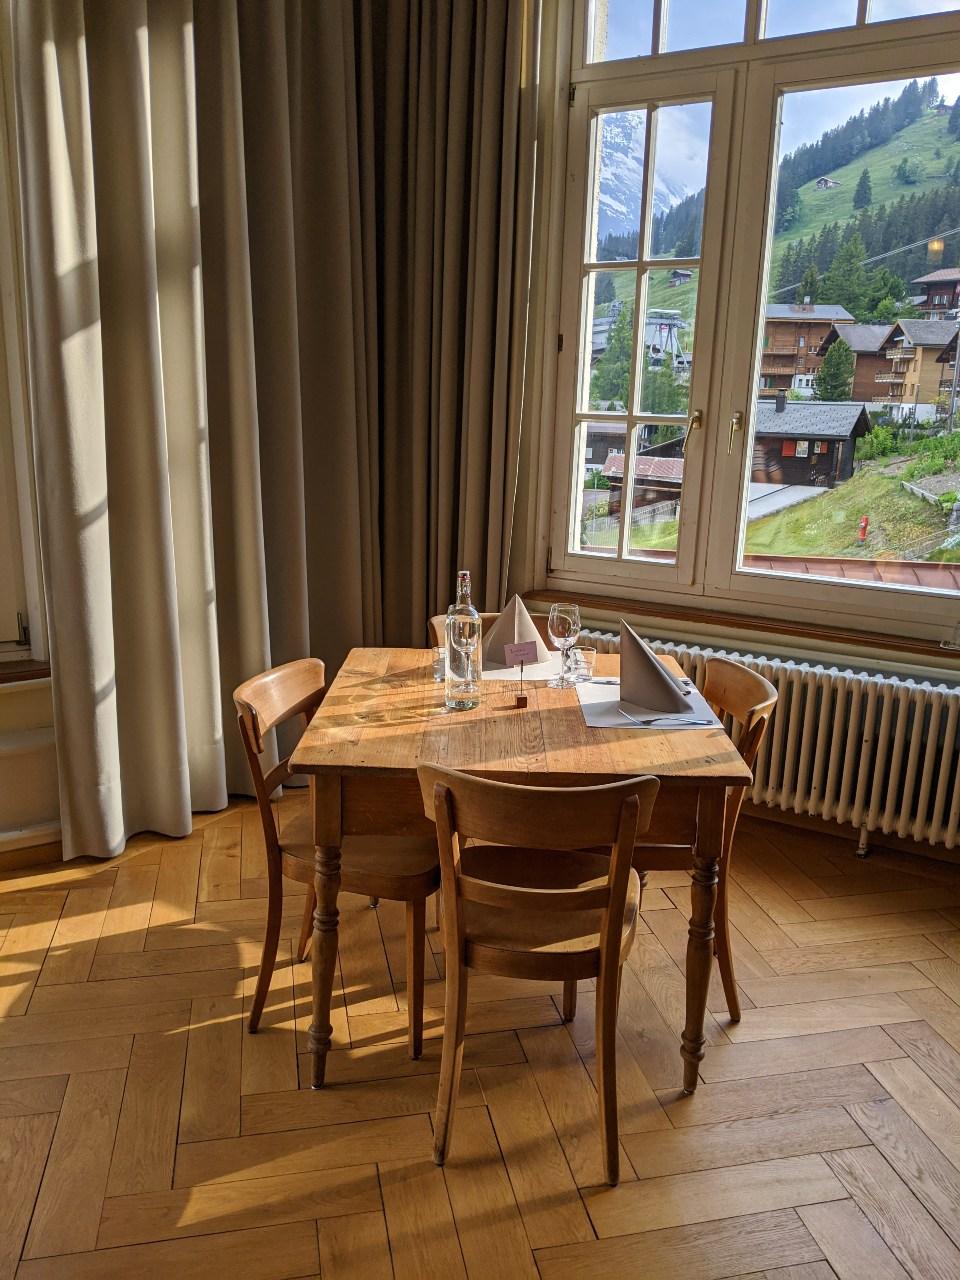 Dining table in hotel Regina in Mürren. Last sunbeams of the day caressing the wooden floor.